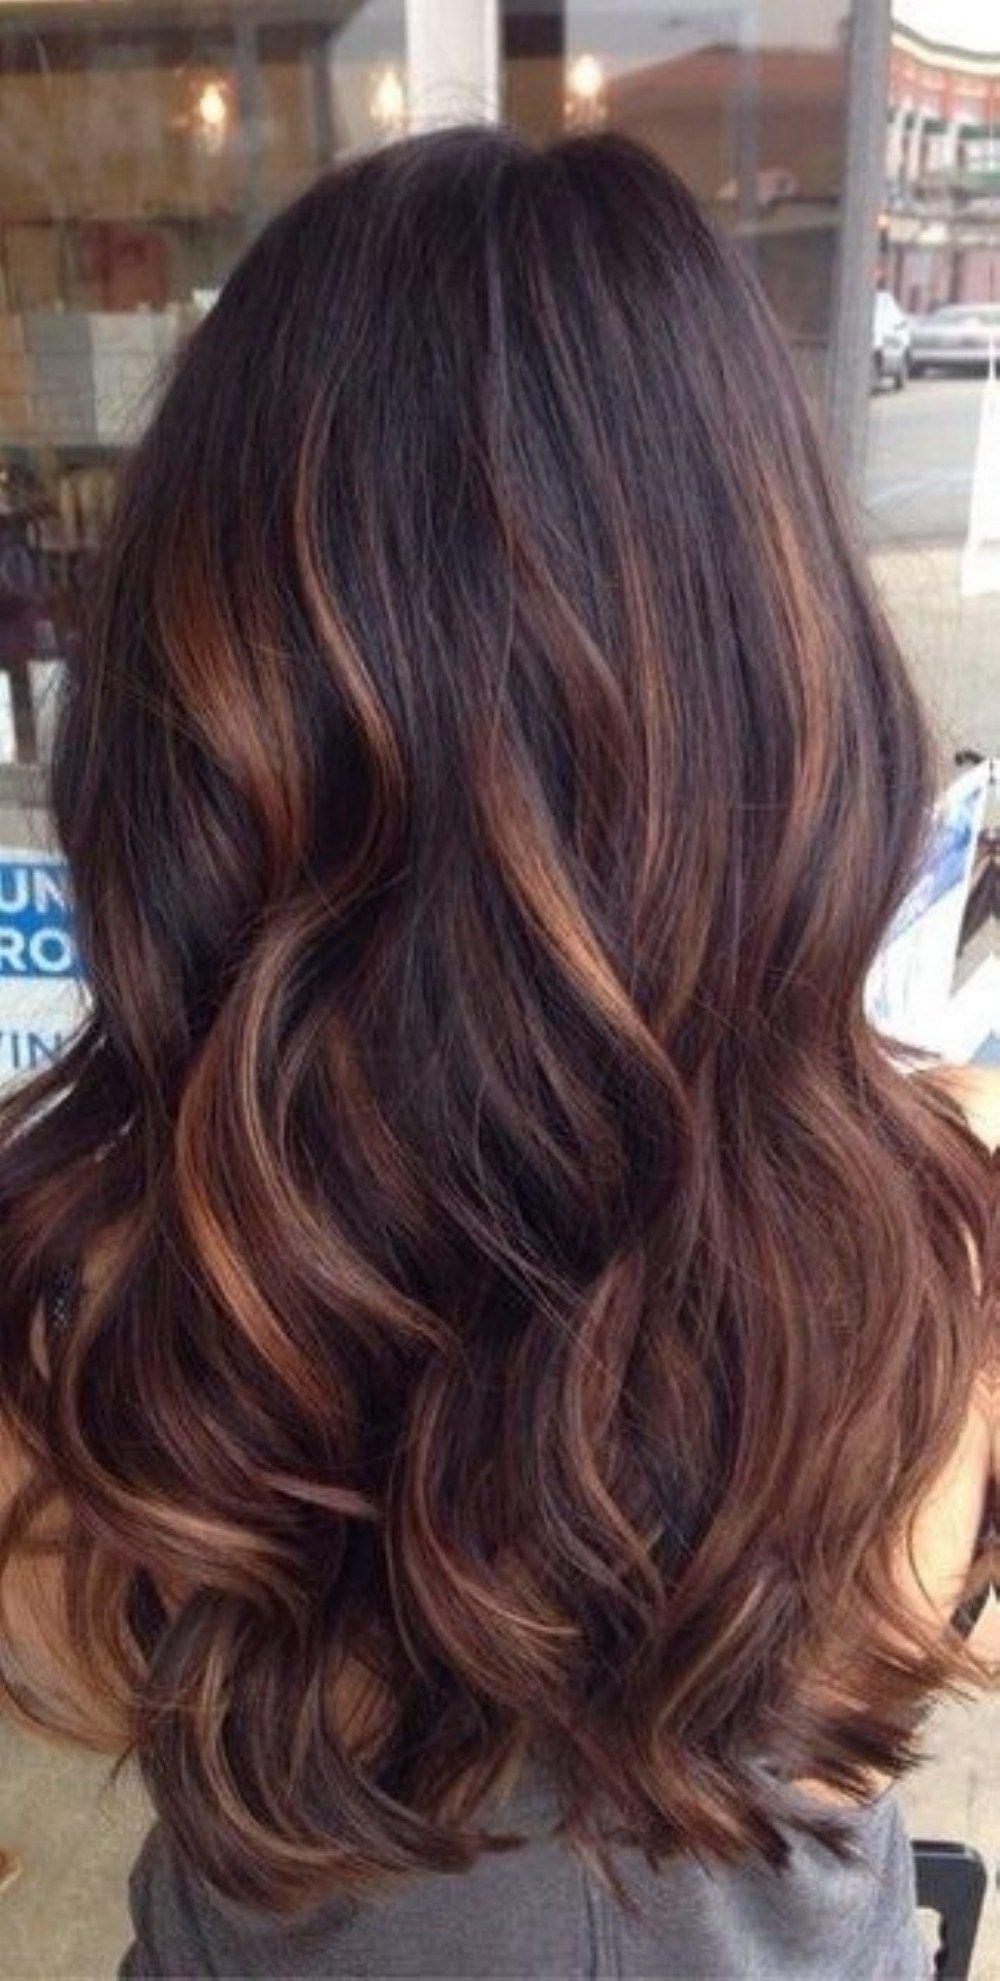 10 Stylish Hair Color Ideas Long Hair top brunette hair color ideas to try 2017 10 hair pinterest 4 2020